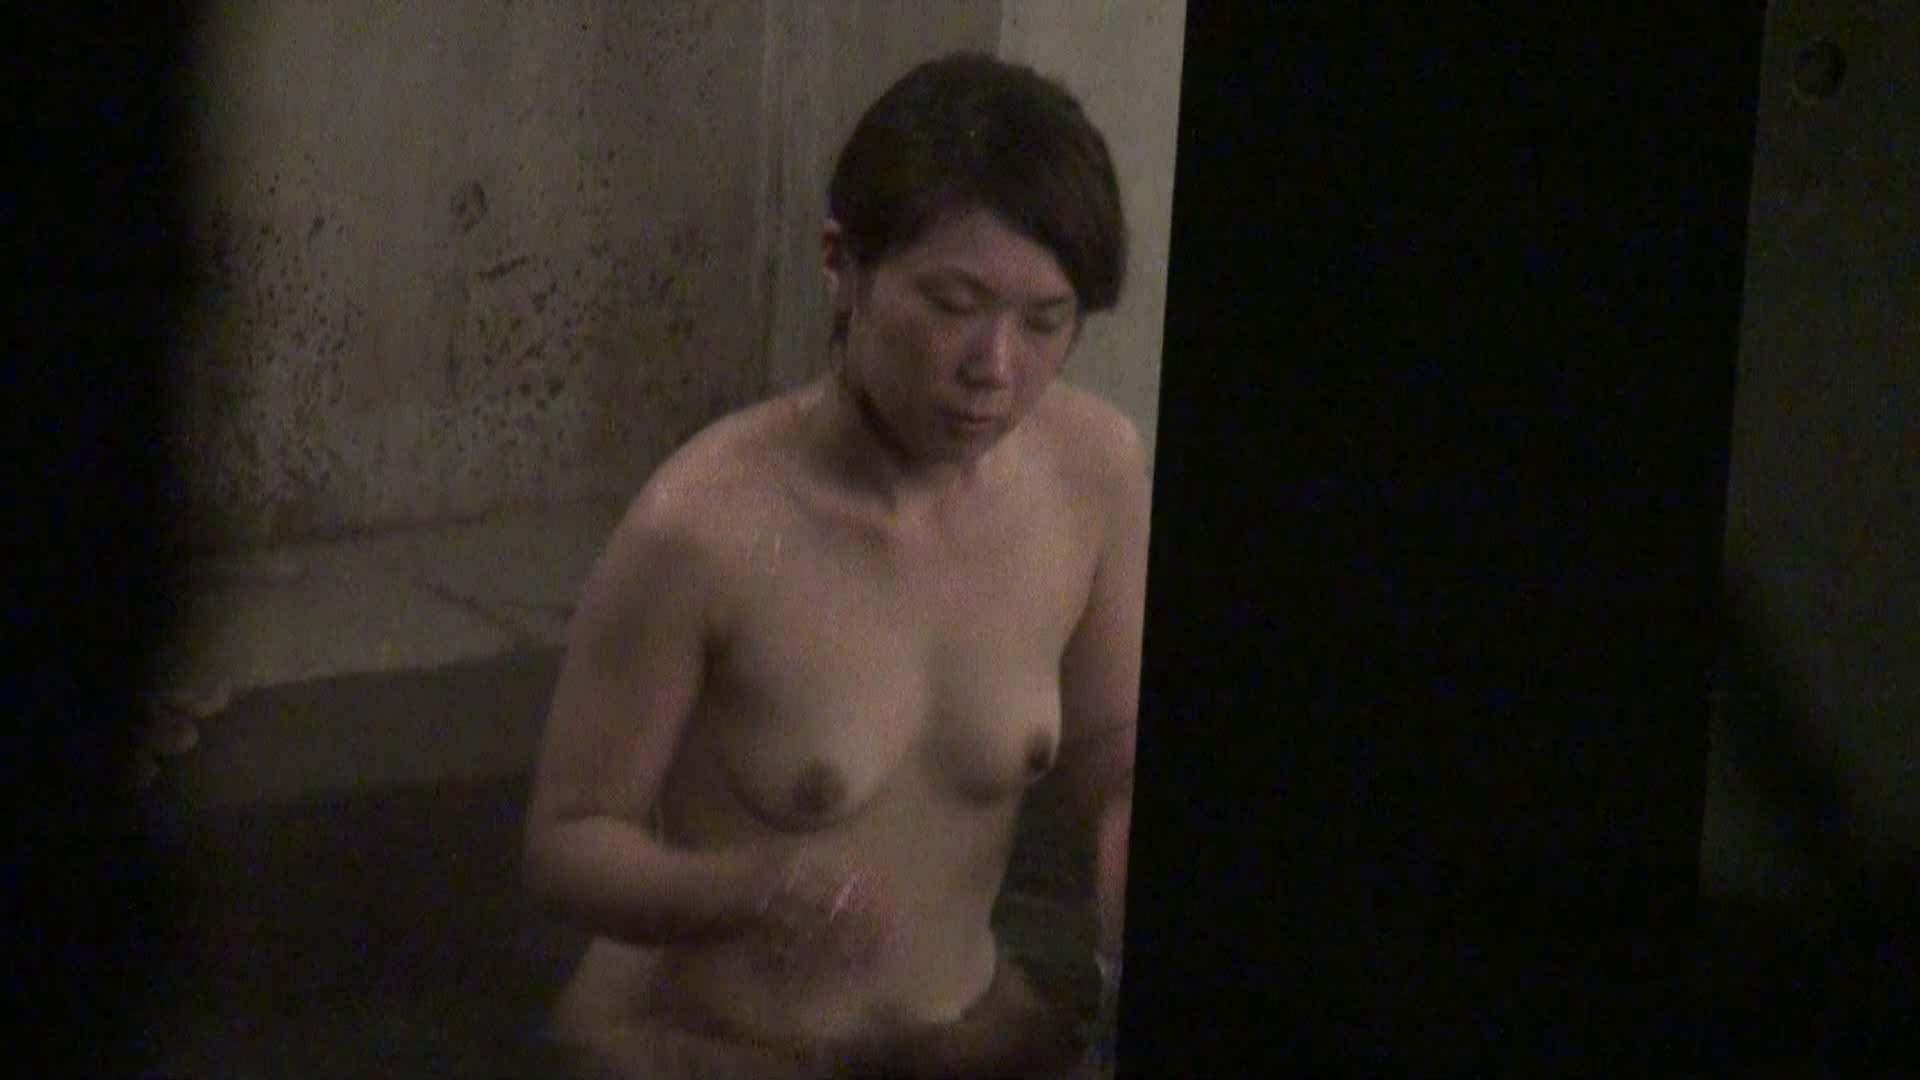 Aquaな露天風呂Vol.426 盗撮師作品 | 露天風呂突入  70pic 55